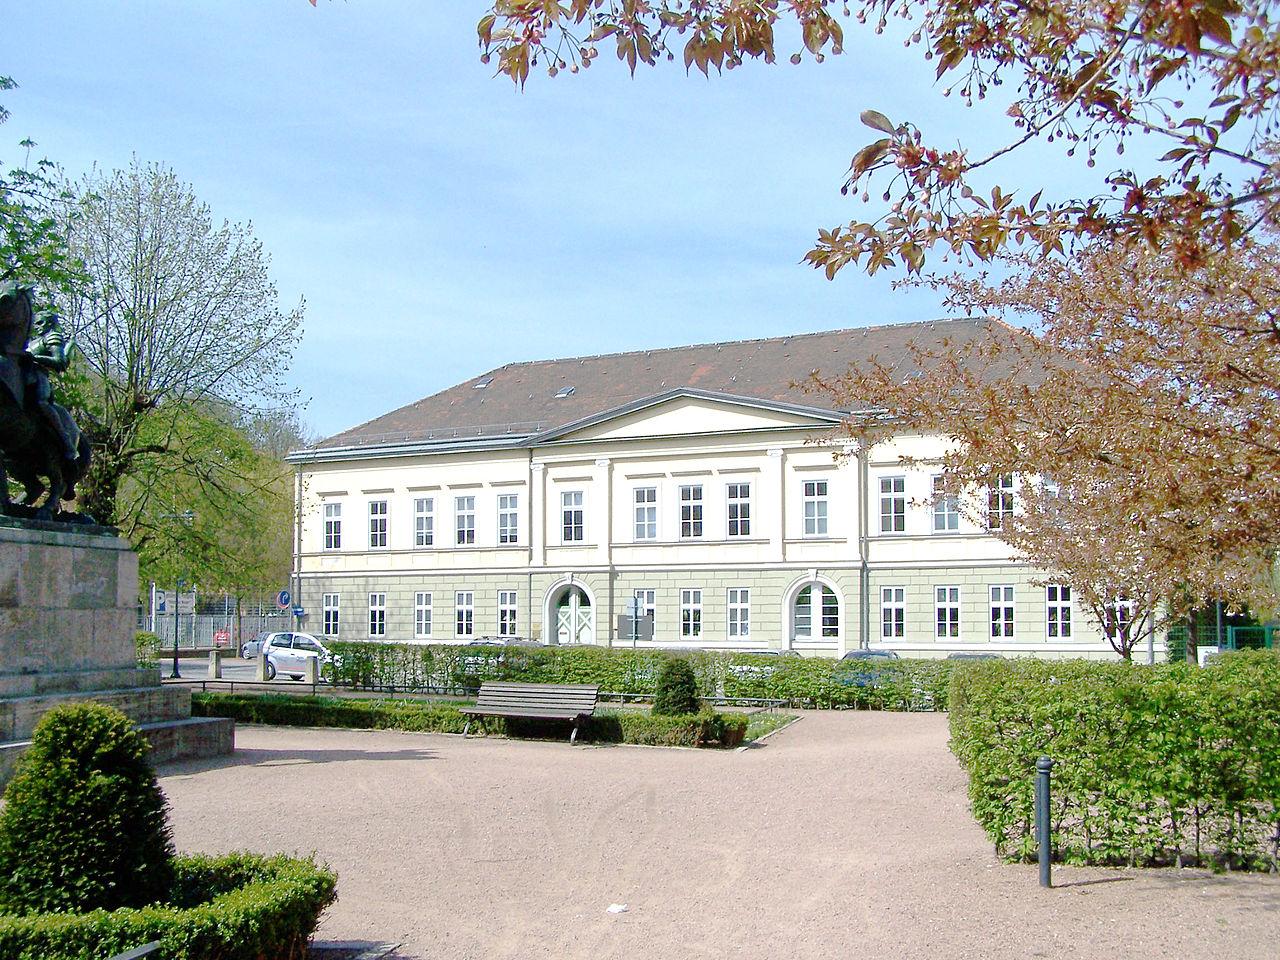 Bild Palais Bechtolsheim Eisenach